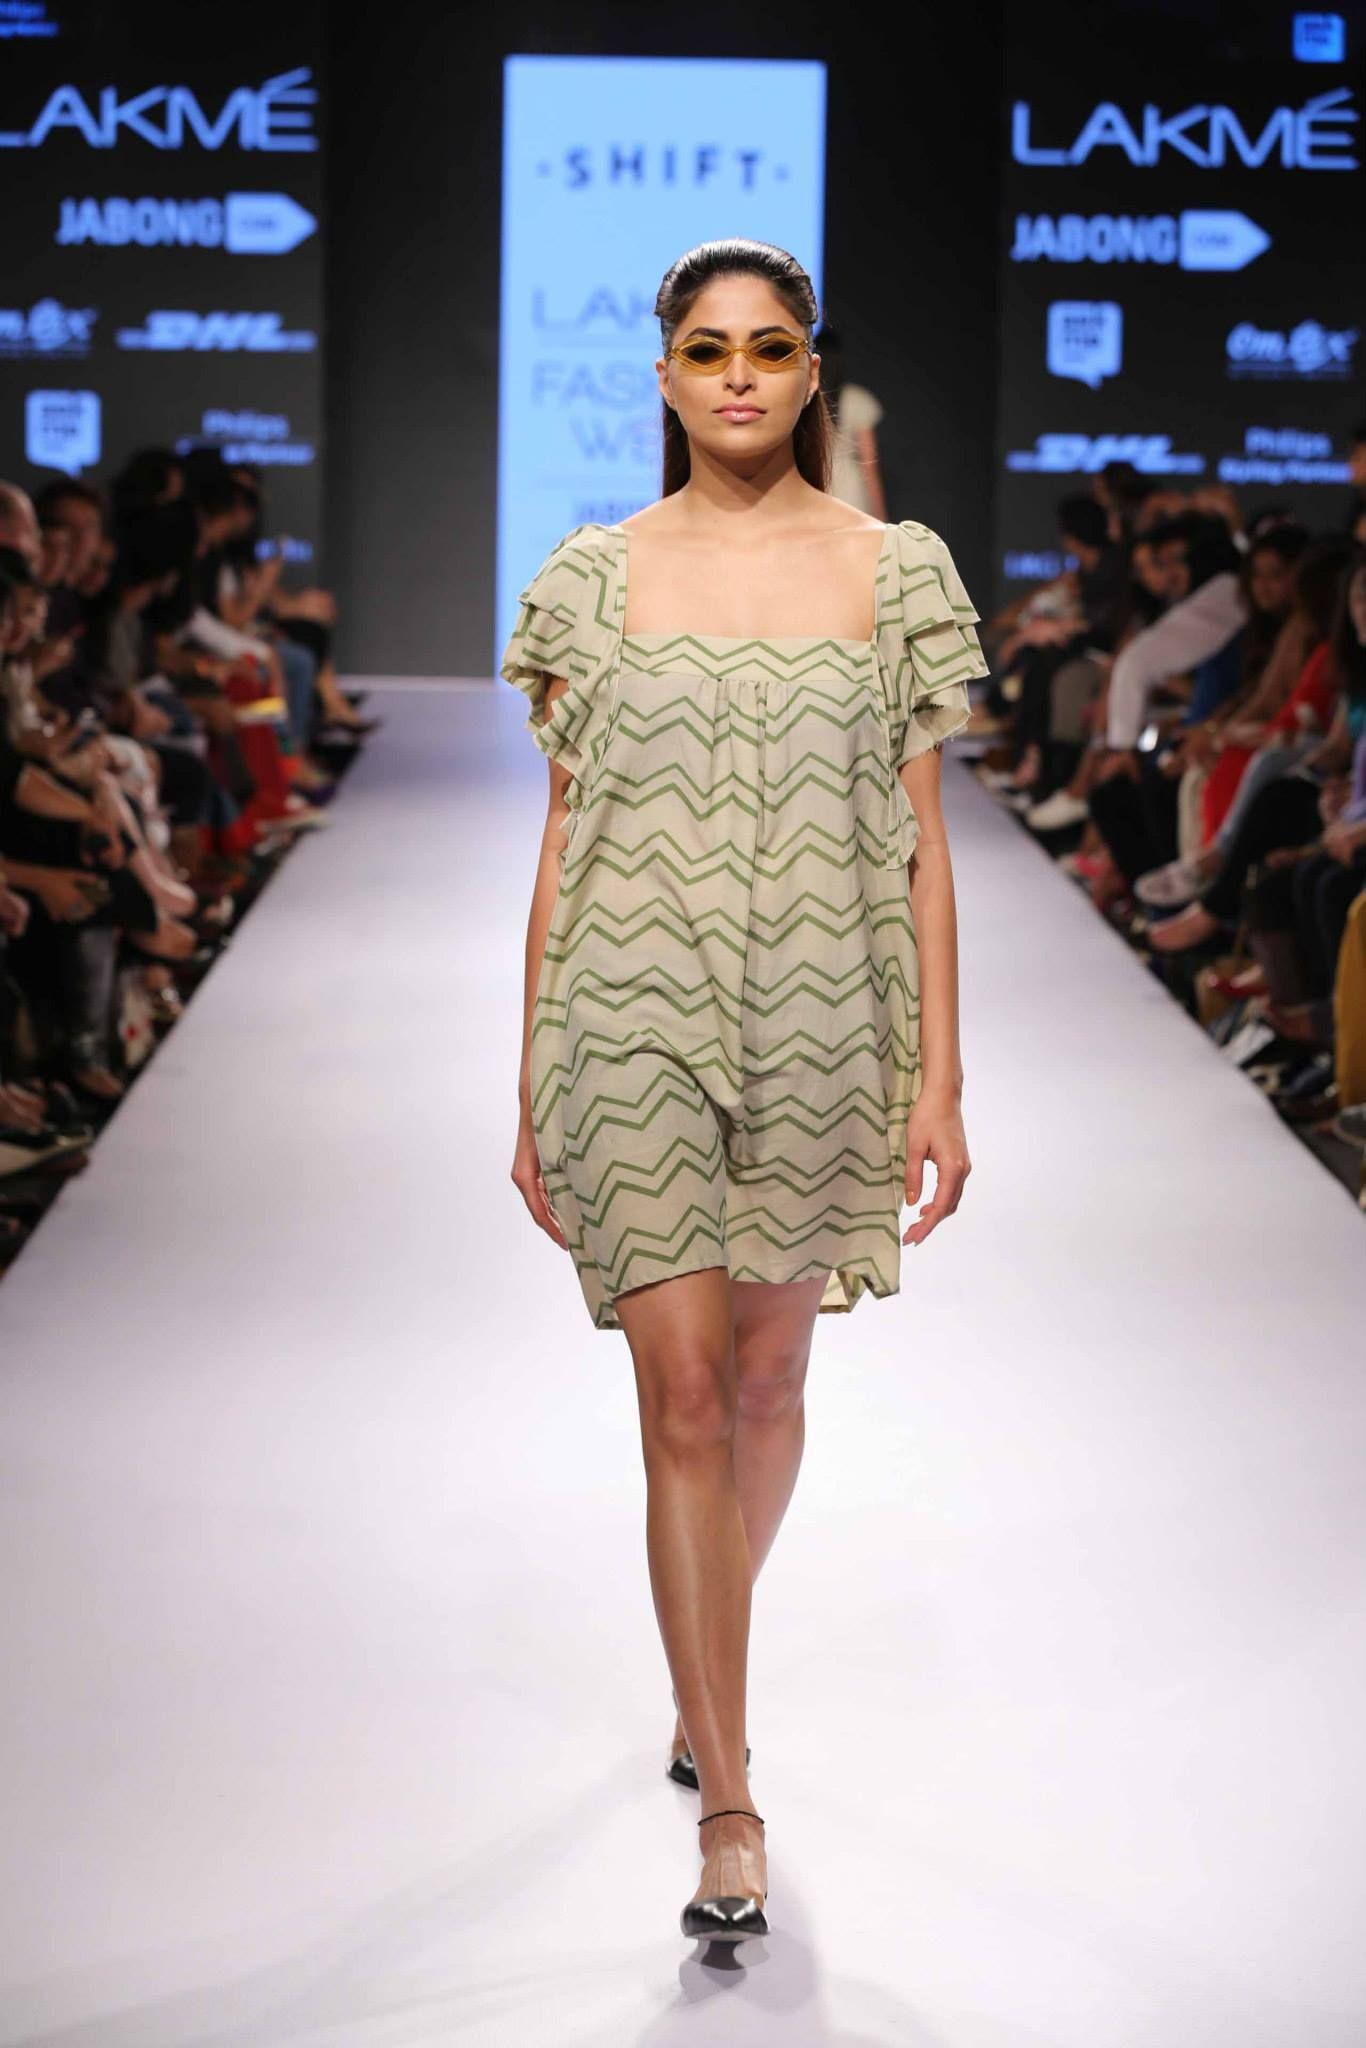 Lakme Fashion Week Summer/Resort 2015- Day3- Show3- Shift #shift #lakmefashionweek #2015 #summerresort #day3 #show3 #shortdress #beachwear #stripes #green #lovely #indianfashion